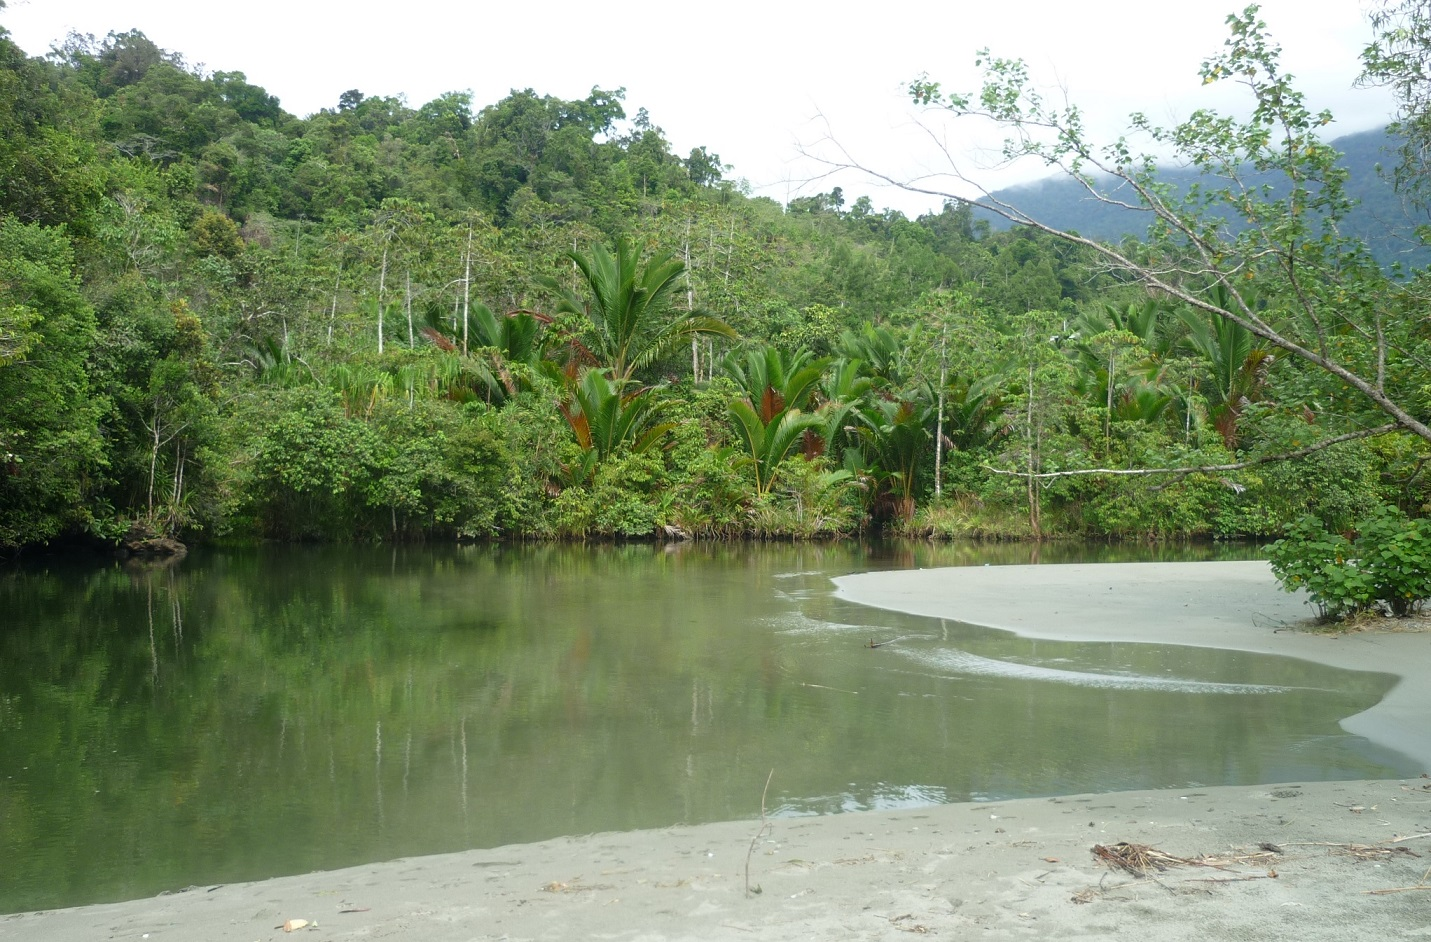 amai beach in depapre district